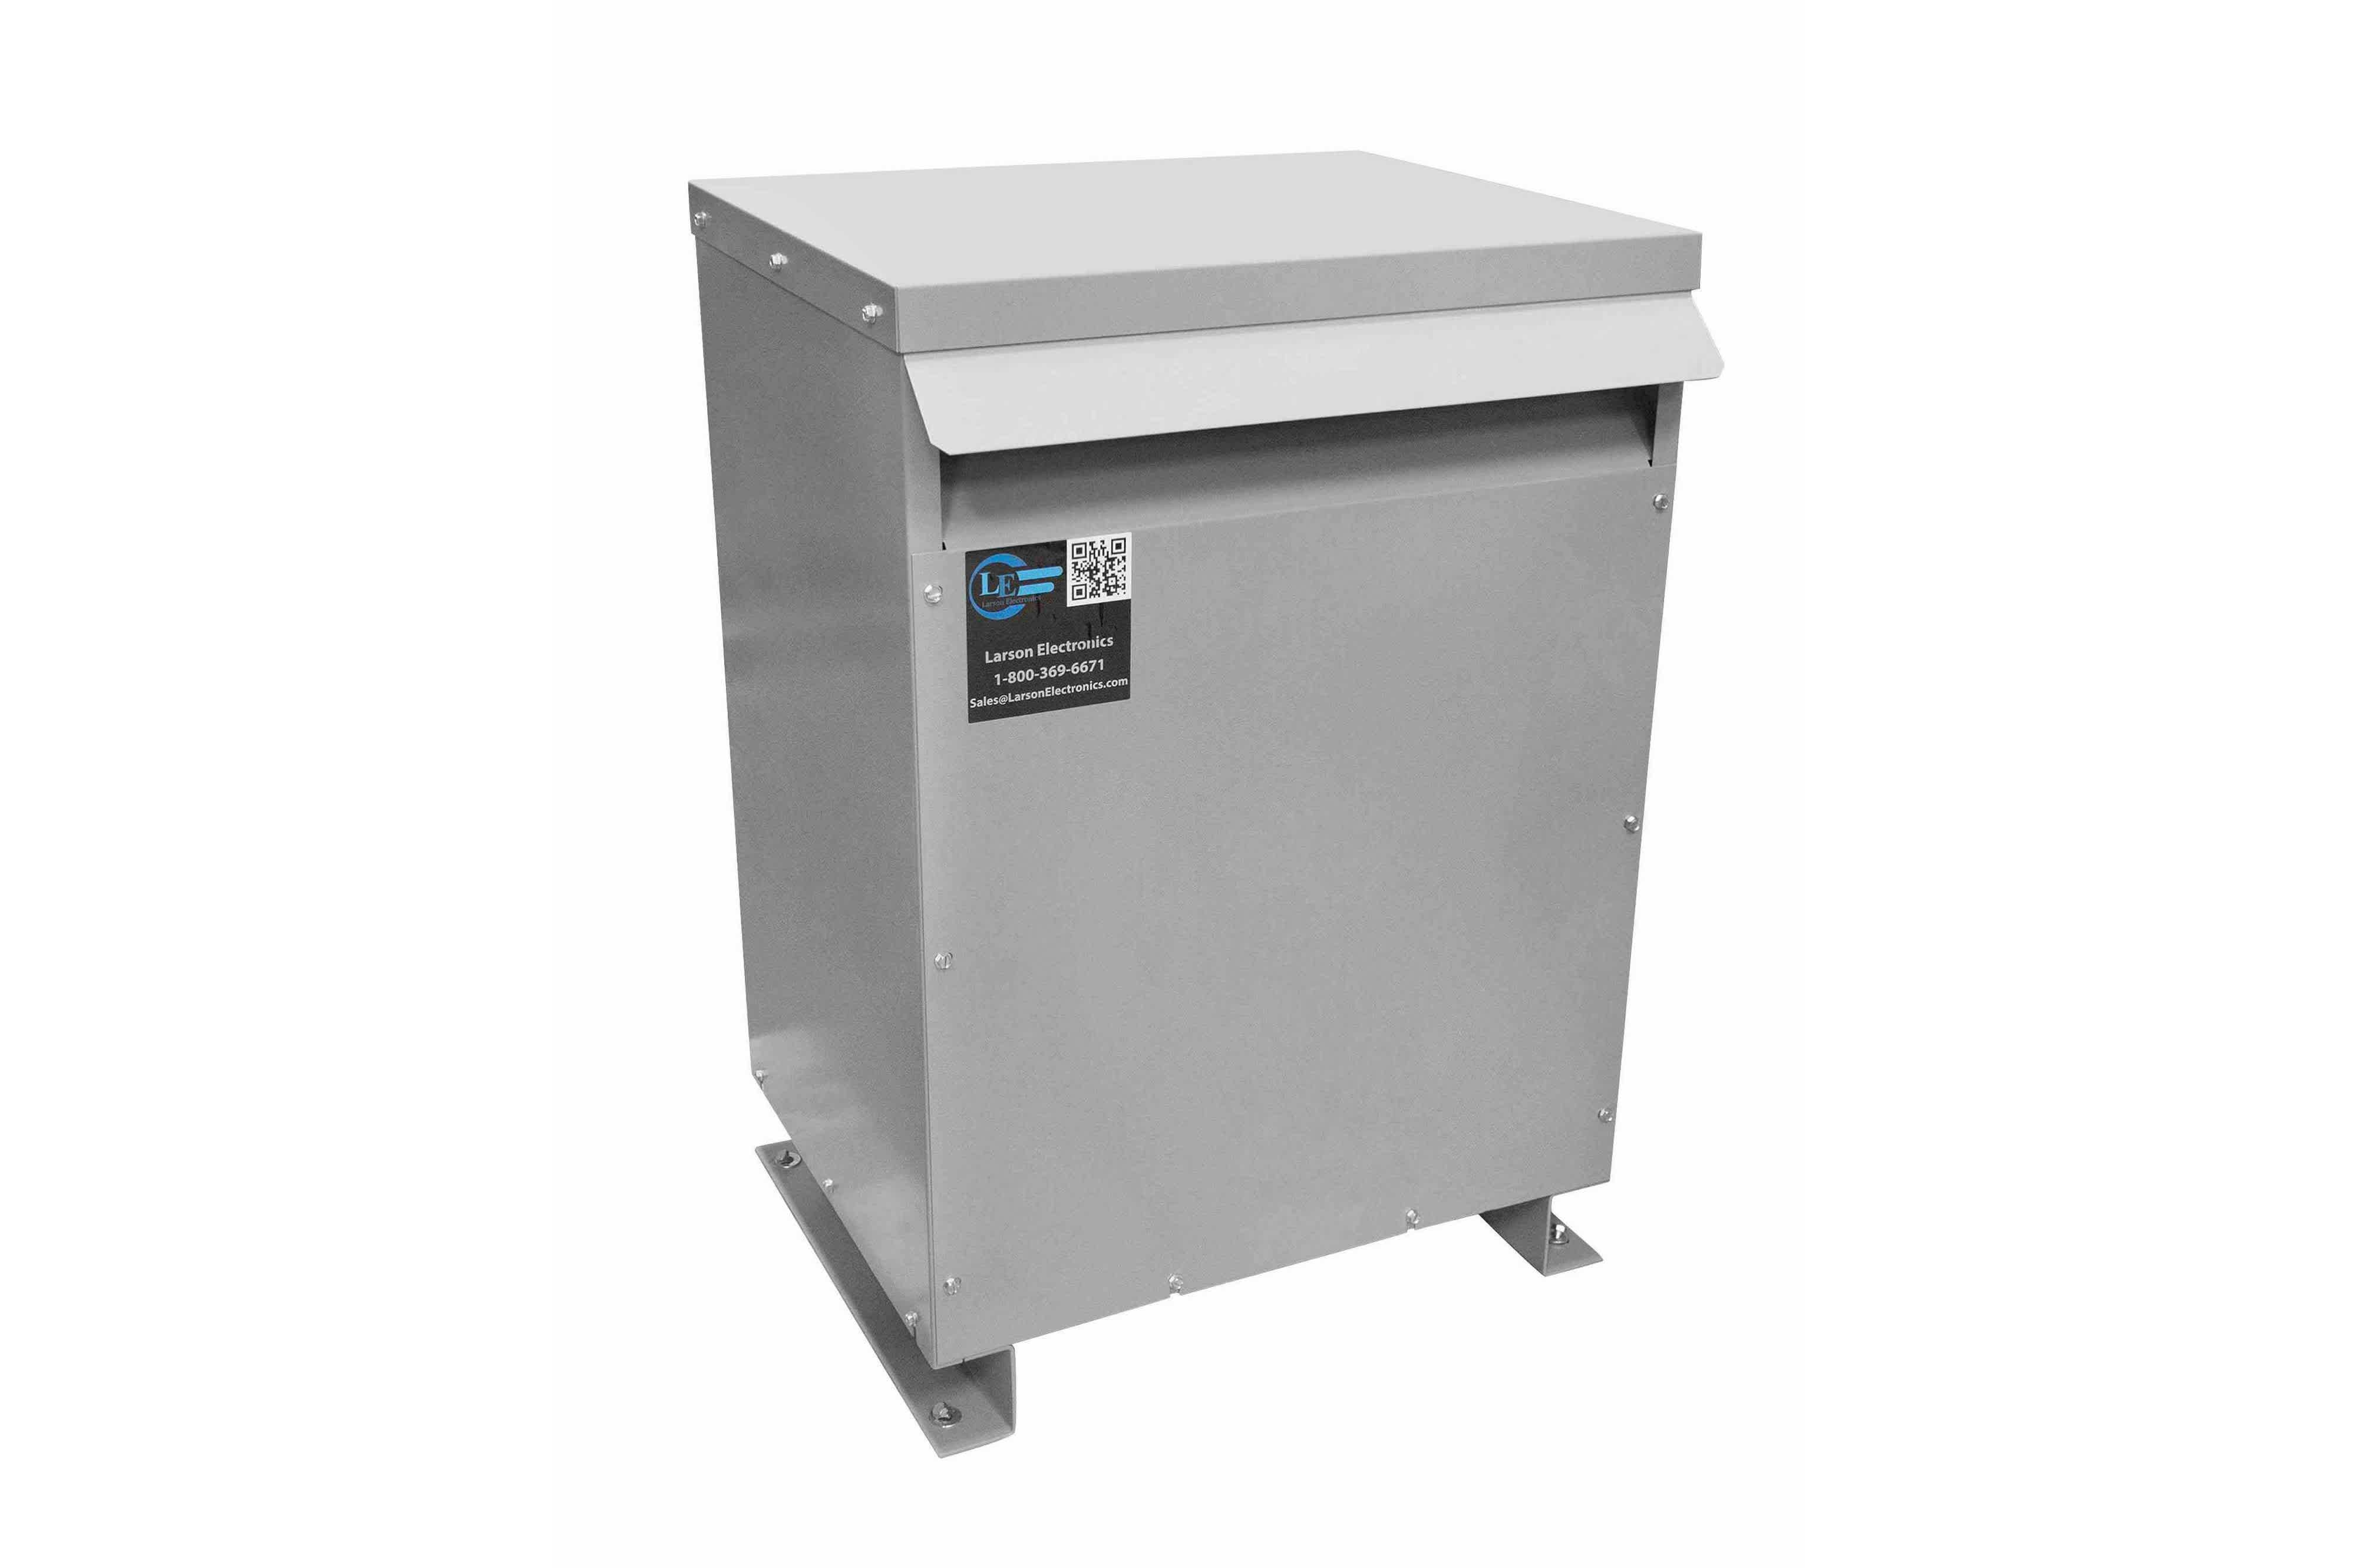 110 kVA 3PH Isolation Transformer, 600V Wye Primary, 415V Delta Secondary, N3R, Ventilated, 60 Hz